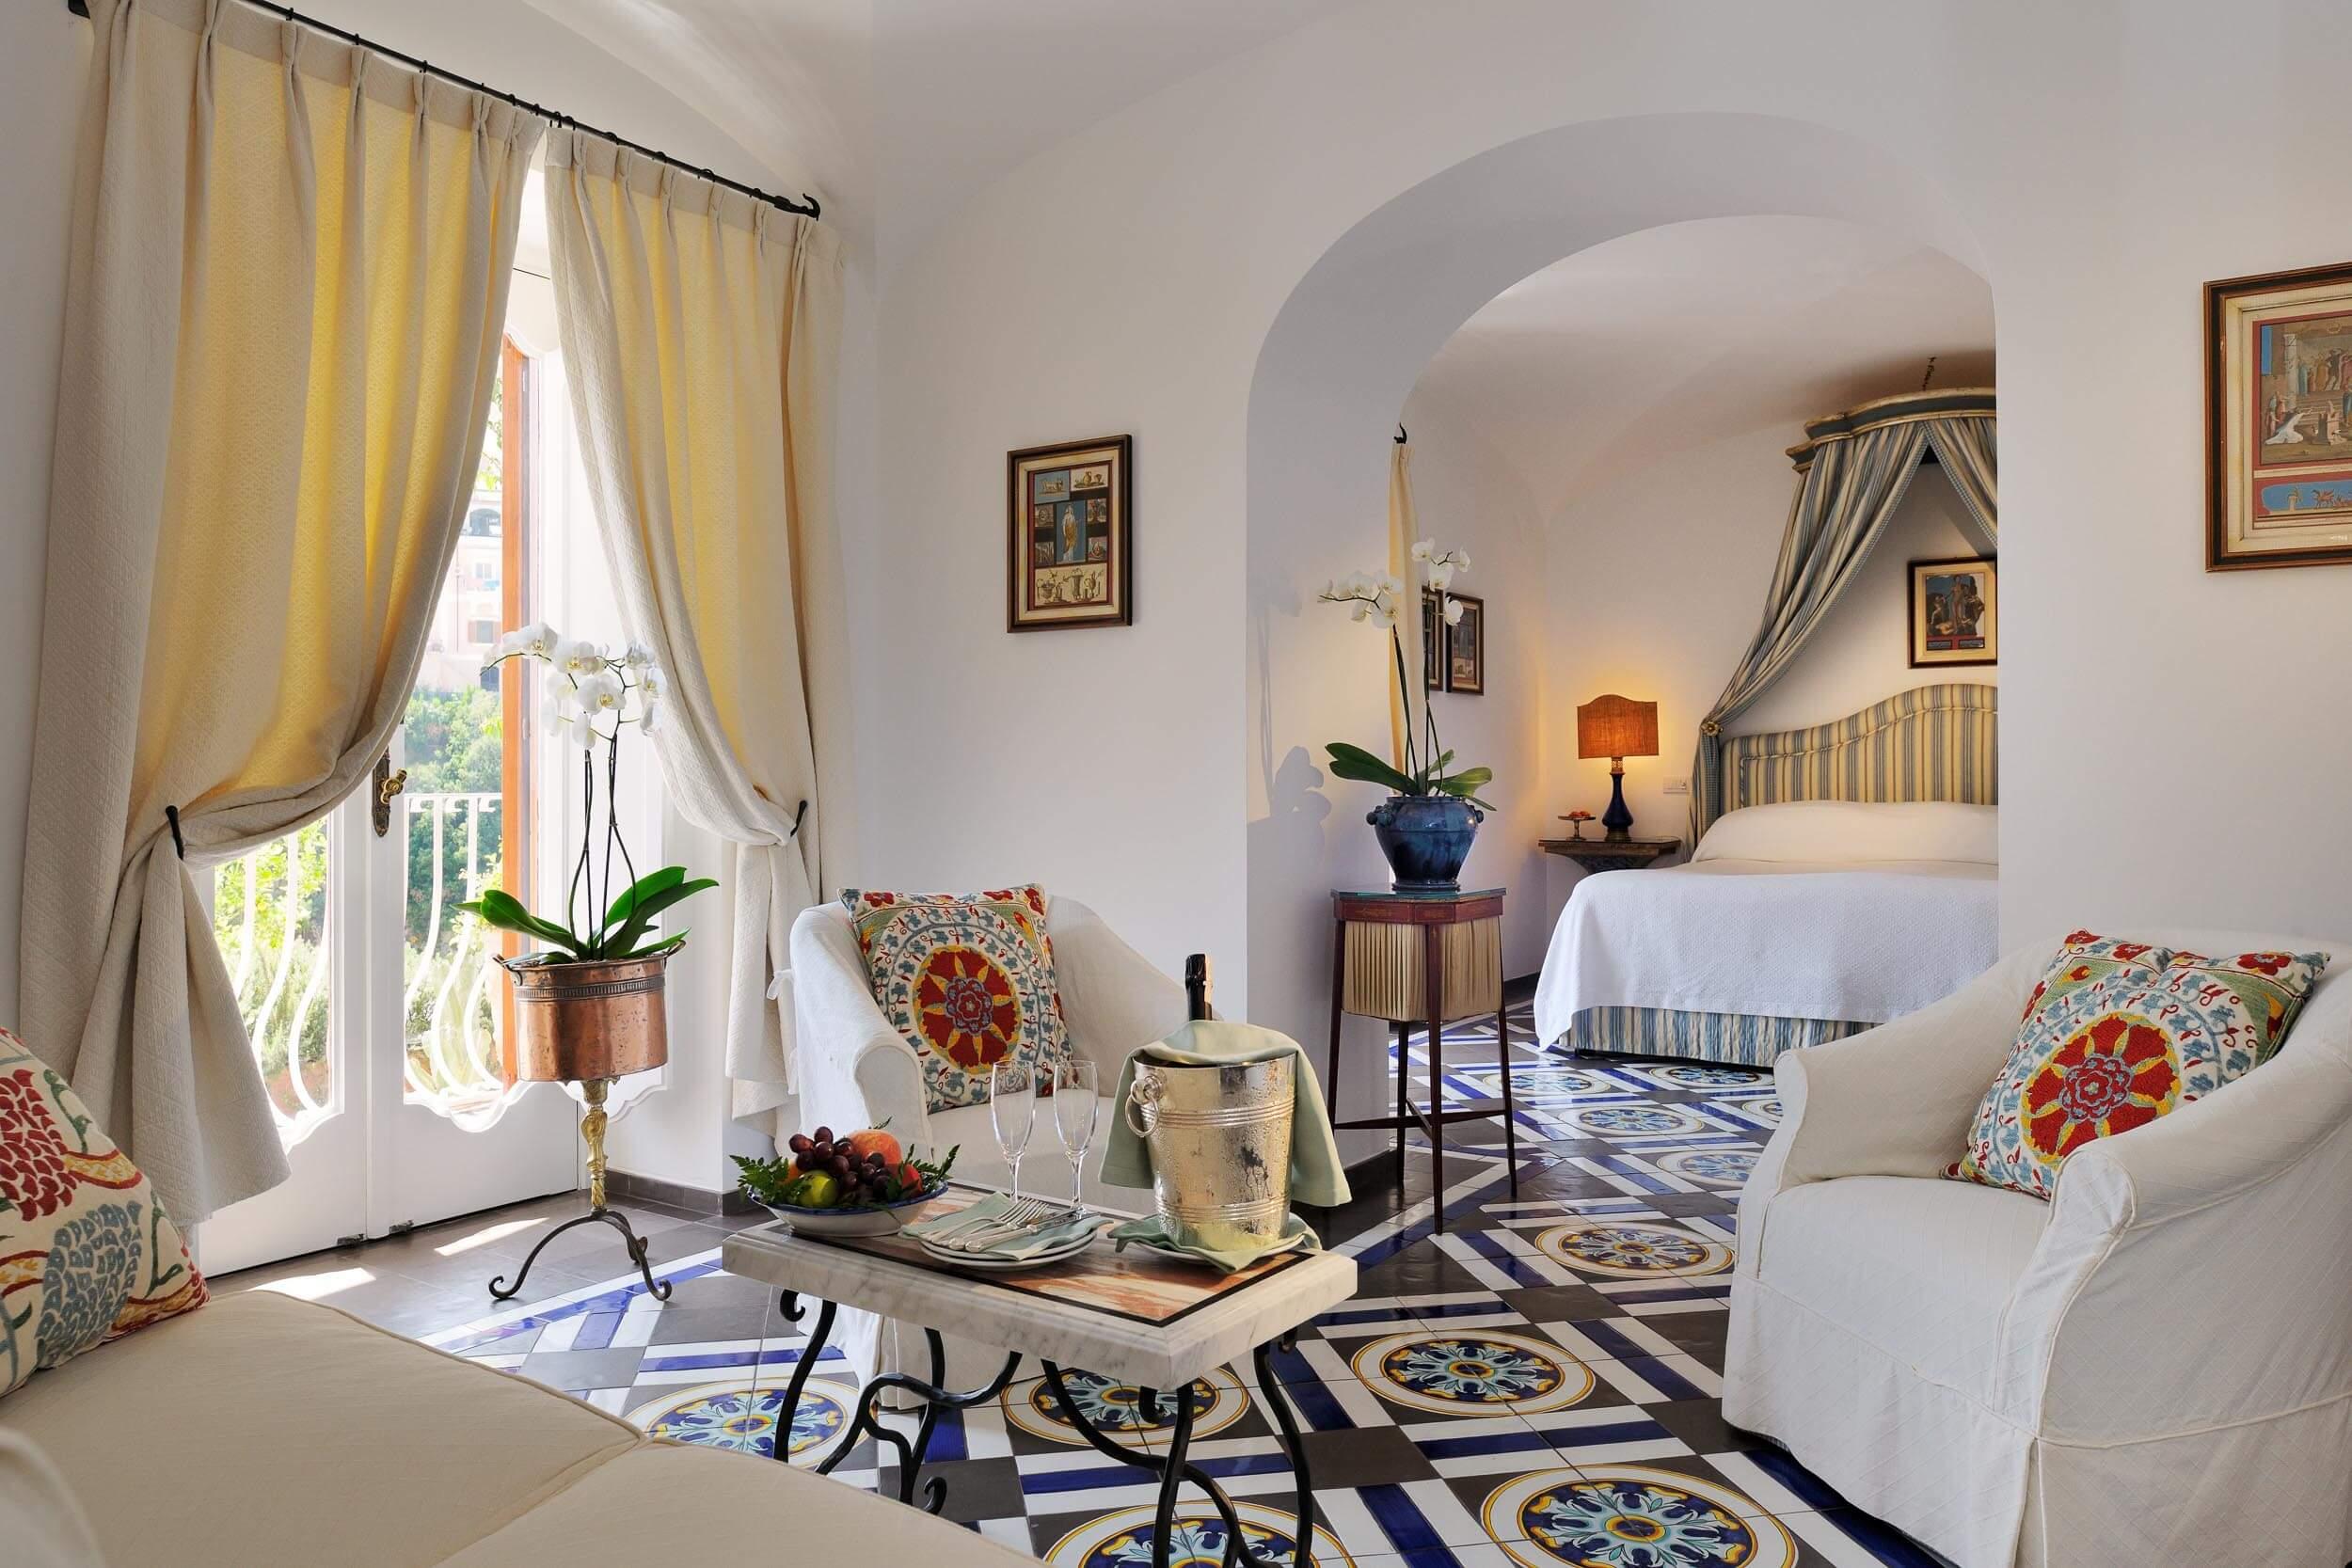 A room at Le Sirenuse in Positano Italy